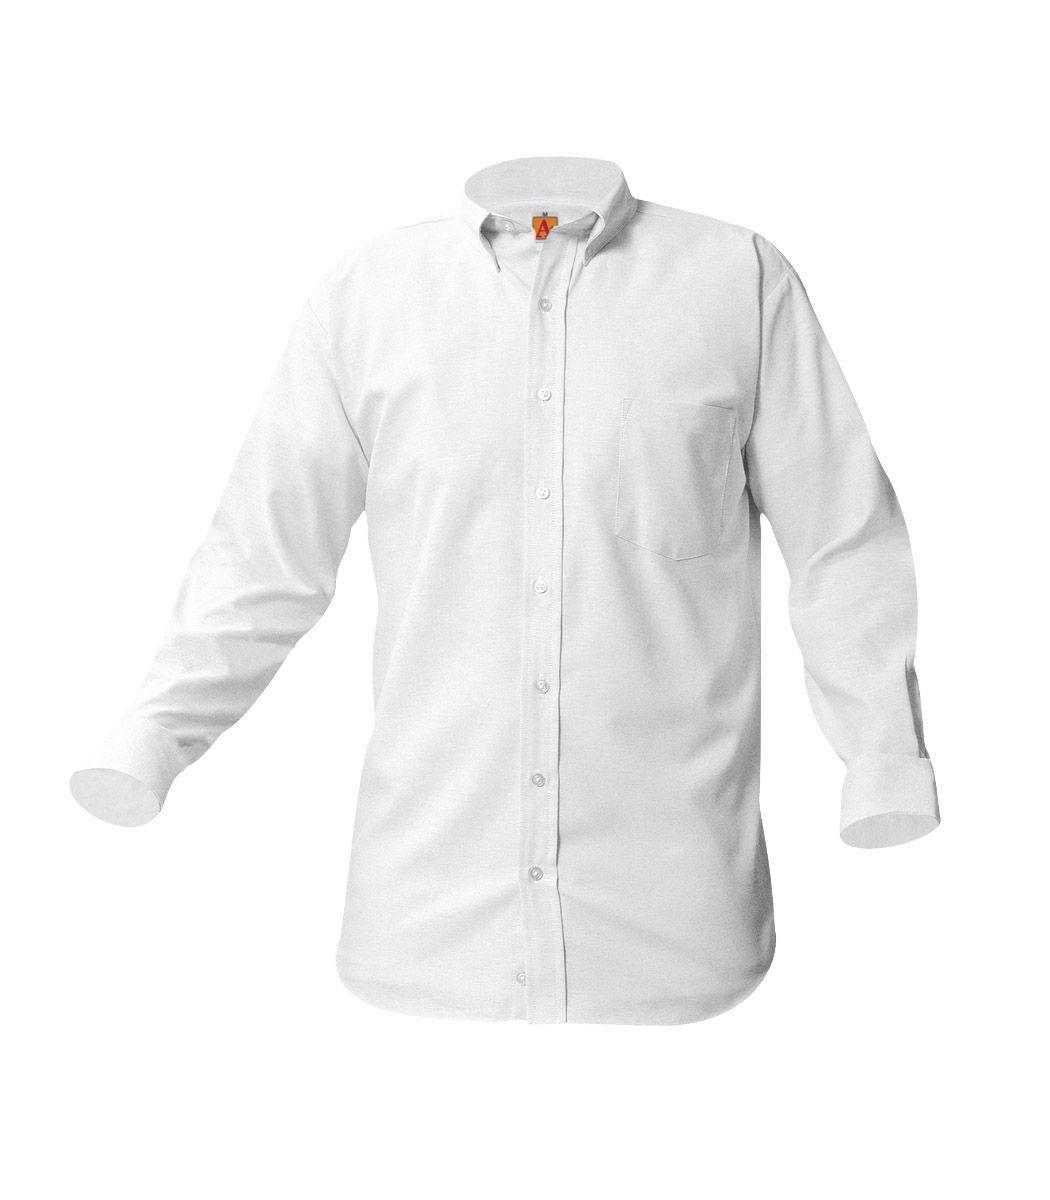 Boy S Long Sleeve Oxford Shirt